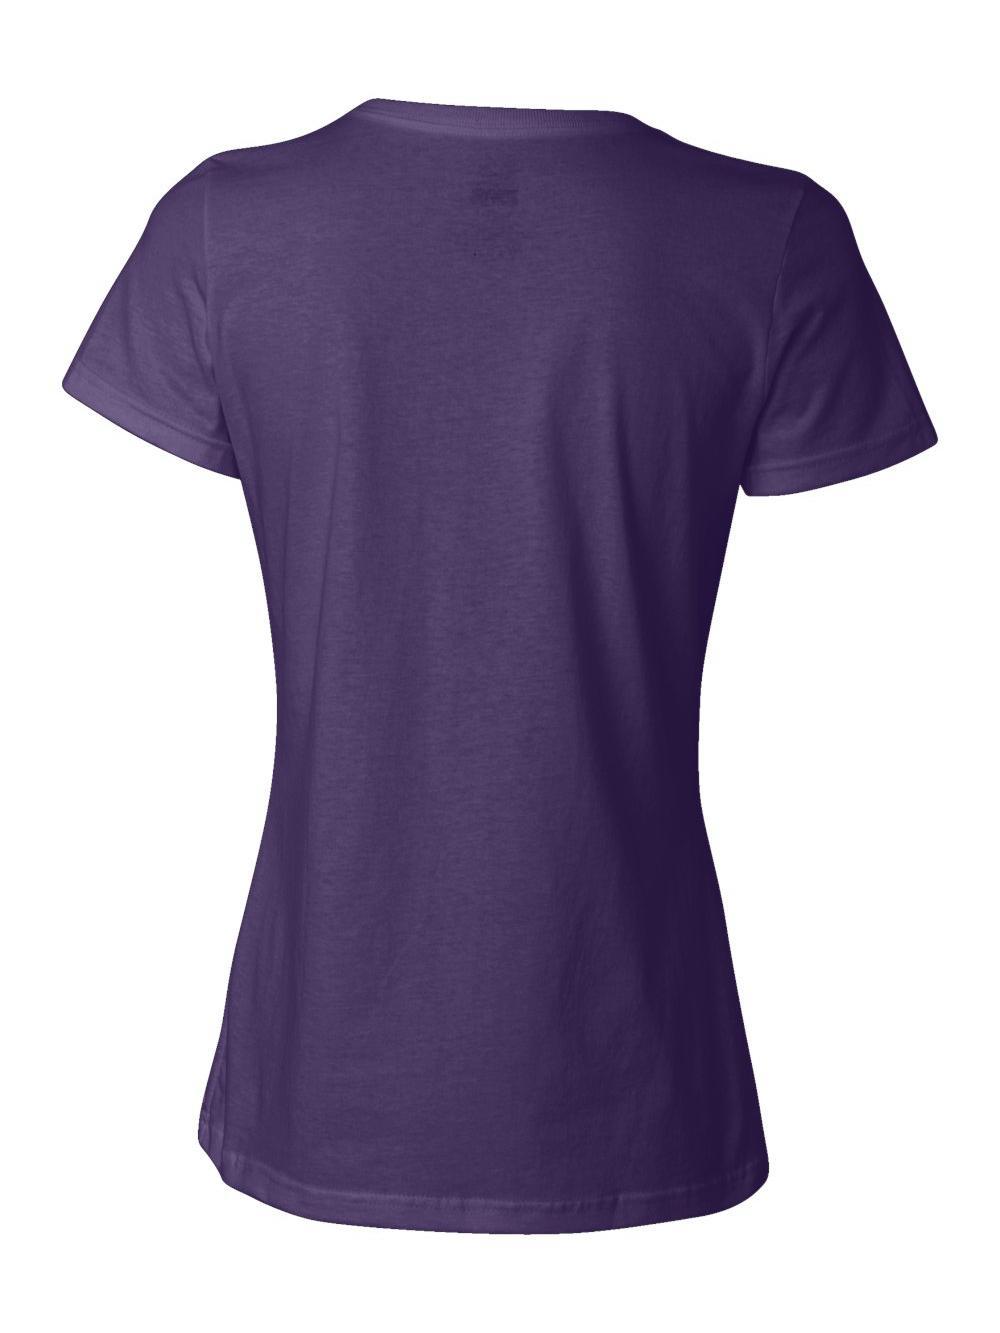 Fruit-of-the-Loom-HD-Cotton-Women-039-s-Short-Sleeve-T-Shirt-L3930R thumbnail 22